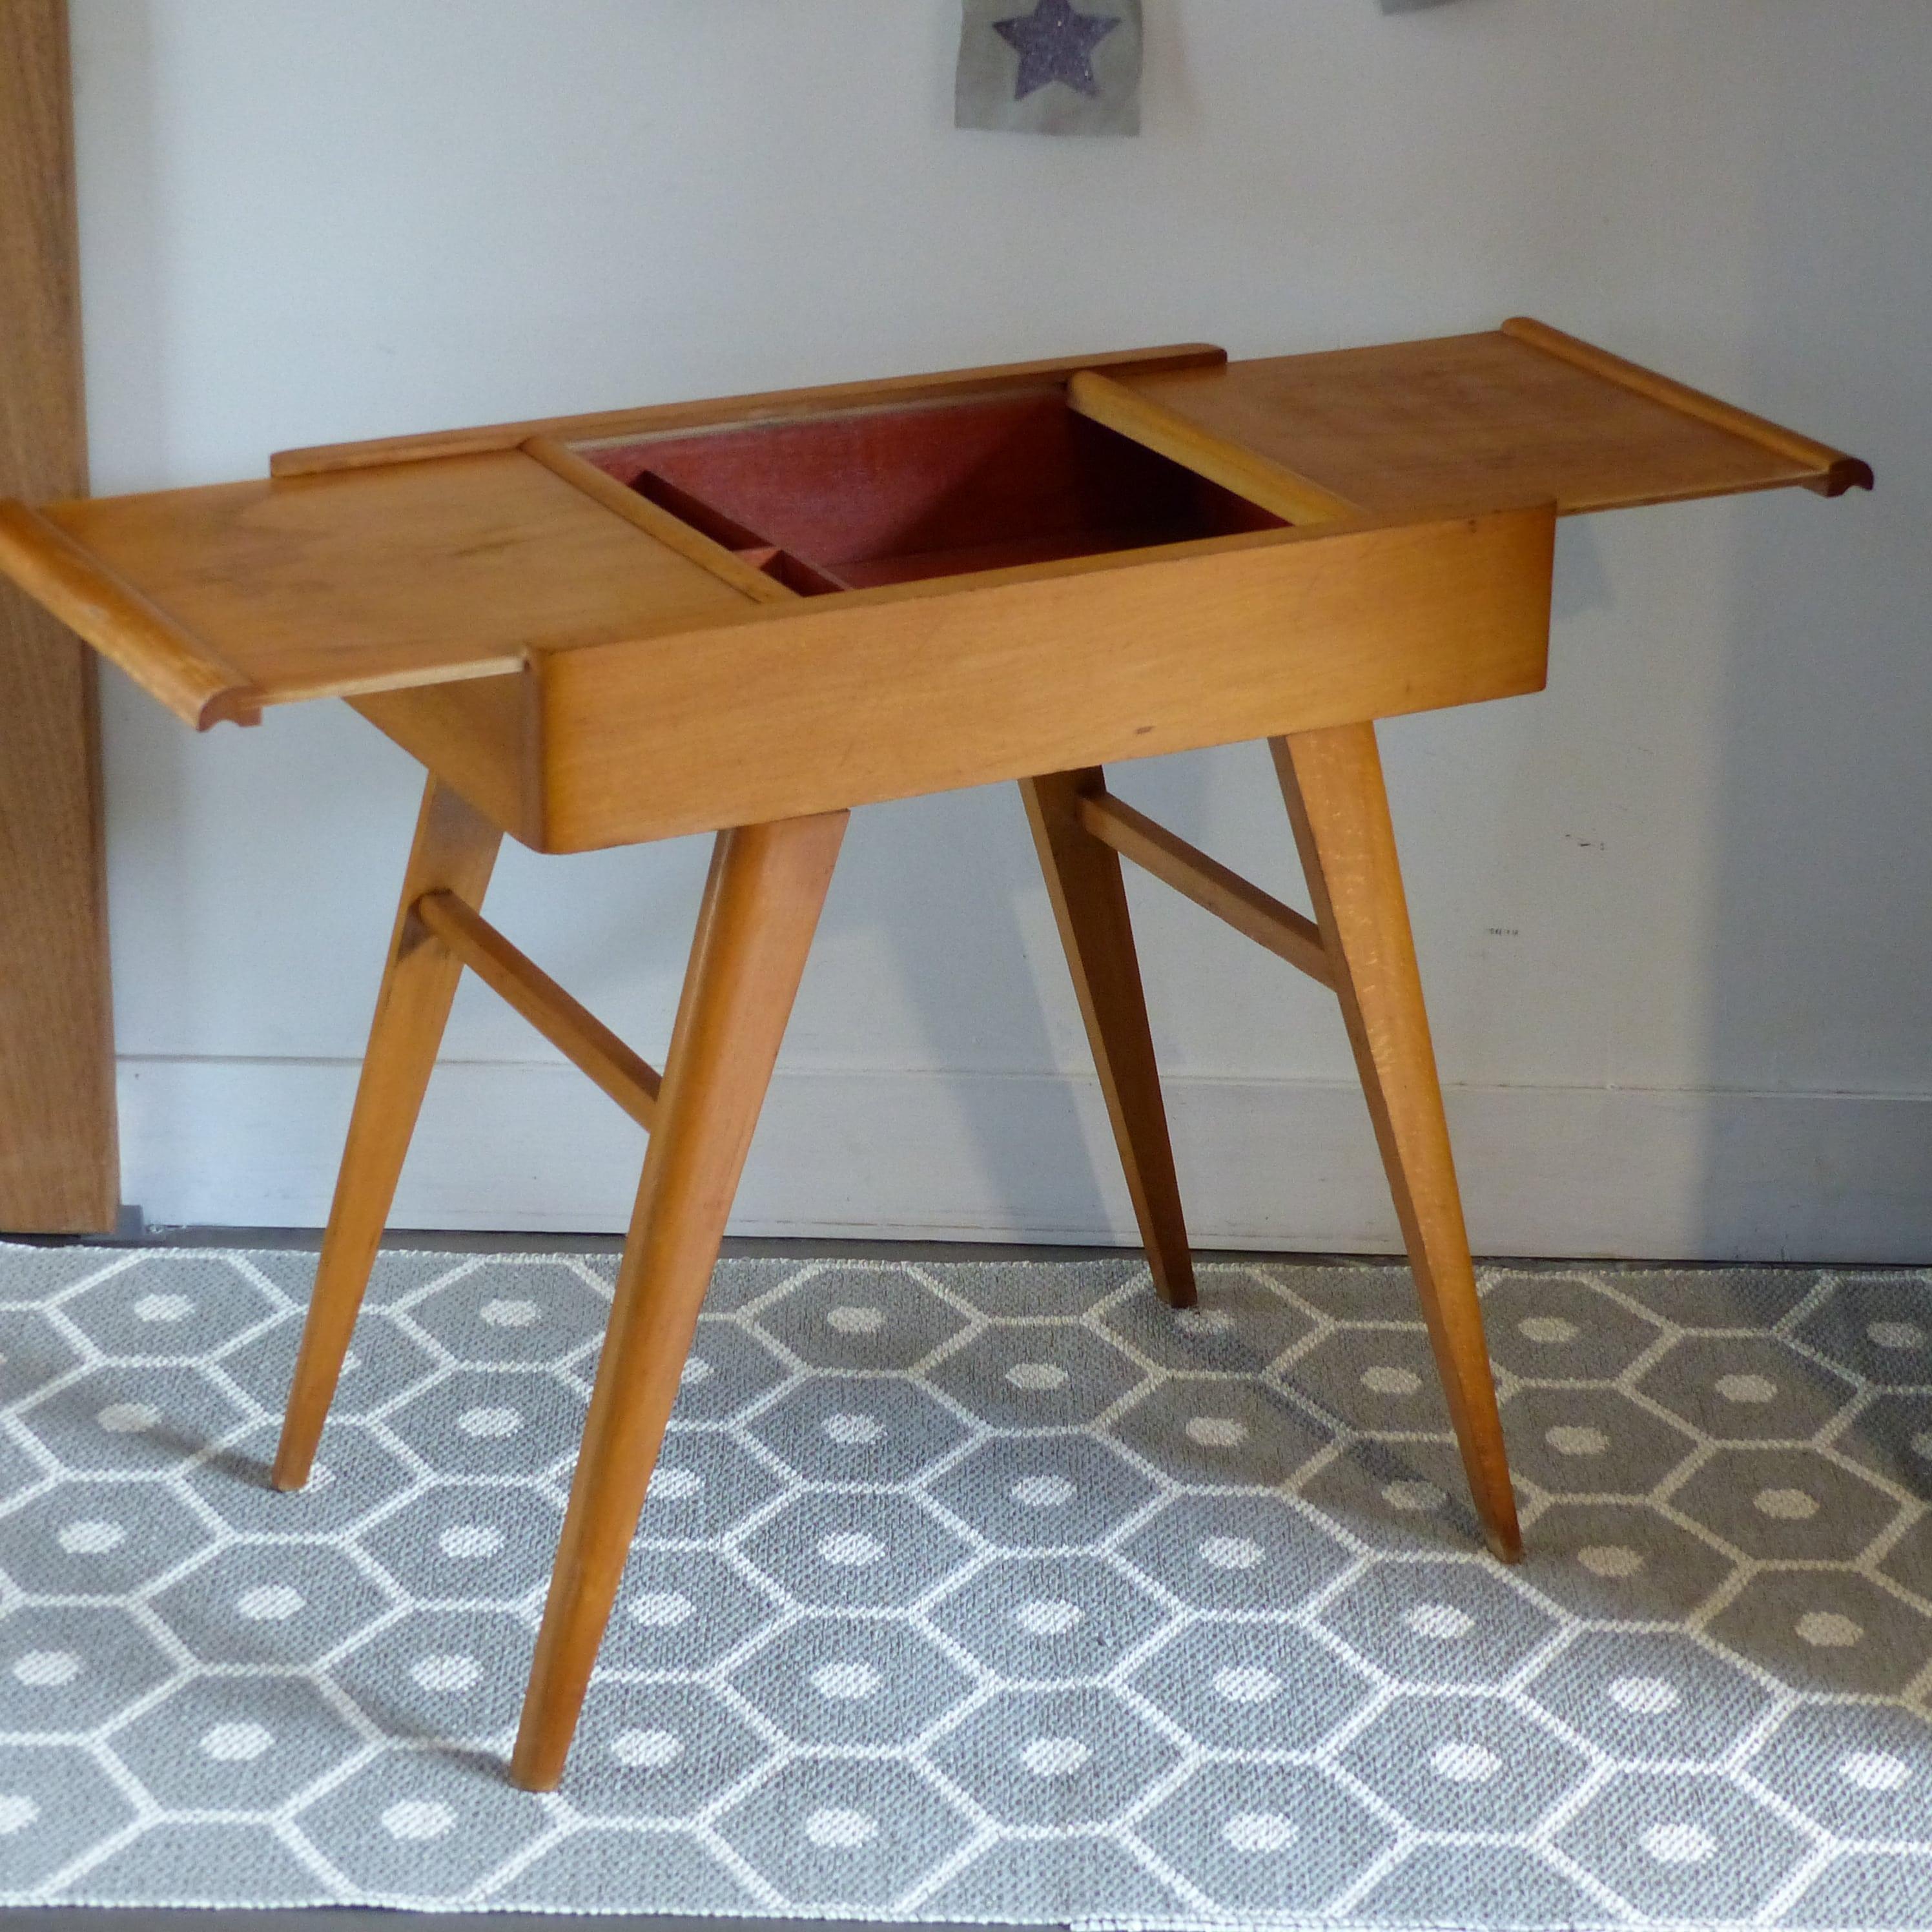 travailleuse vintage pieds compas lignedebrocante brocante en ligne chine pour vous. Black Bedroom Furniture Sets. Home Design Ideas